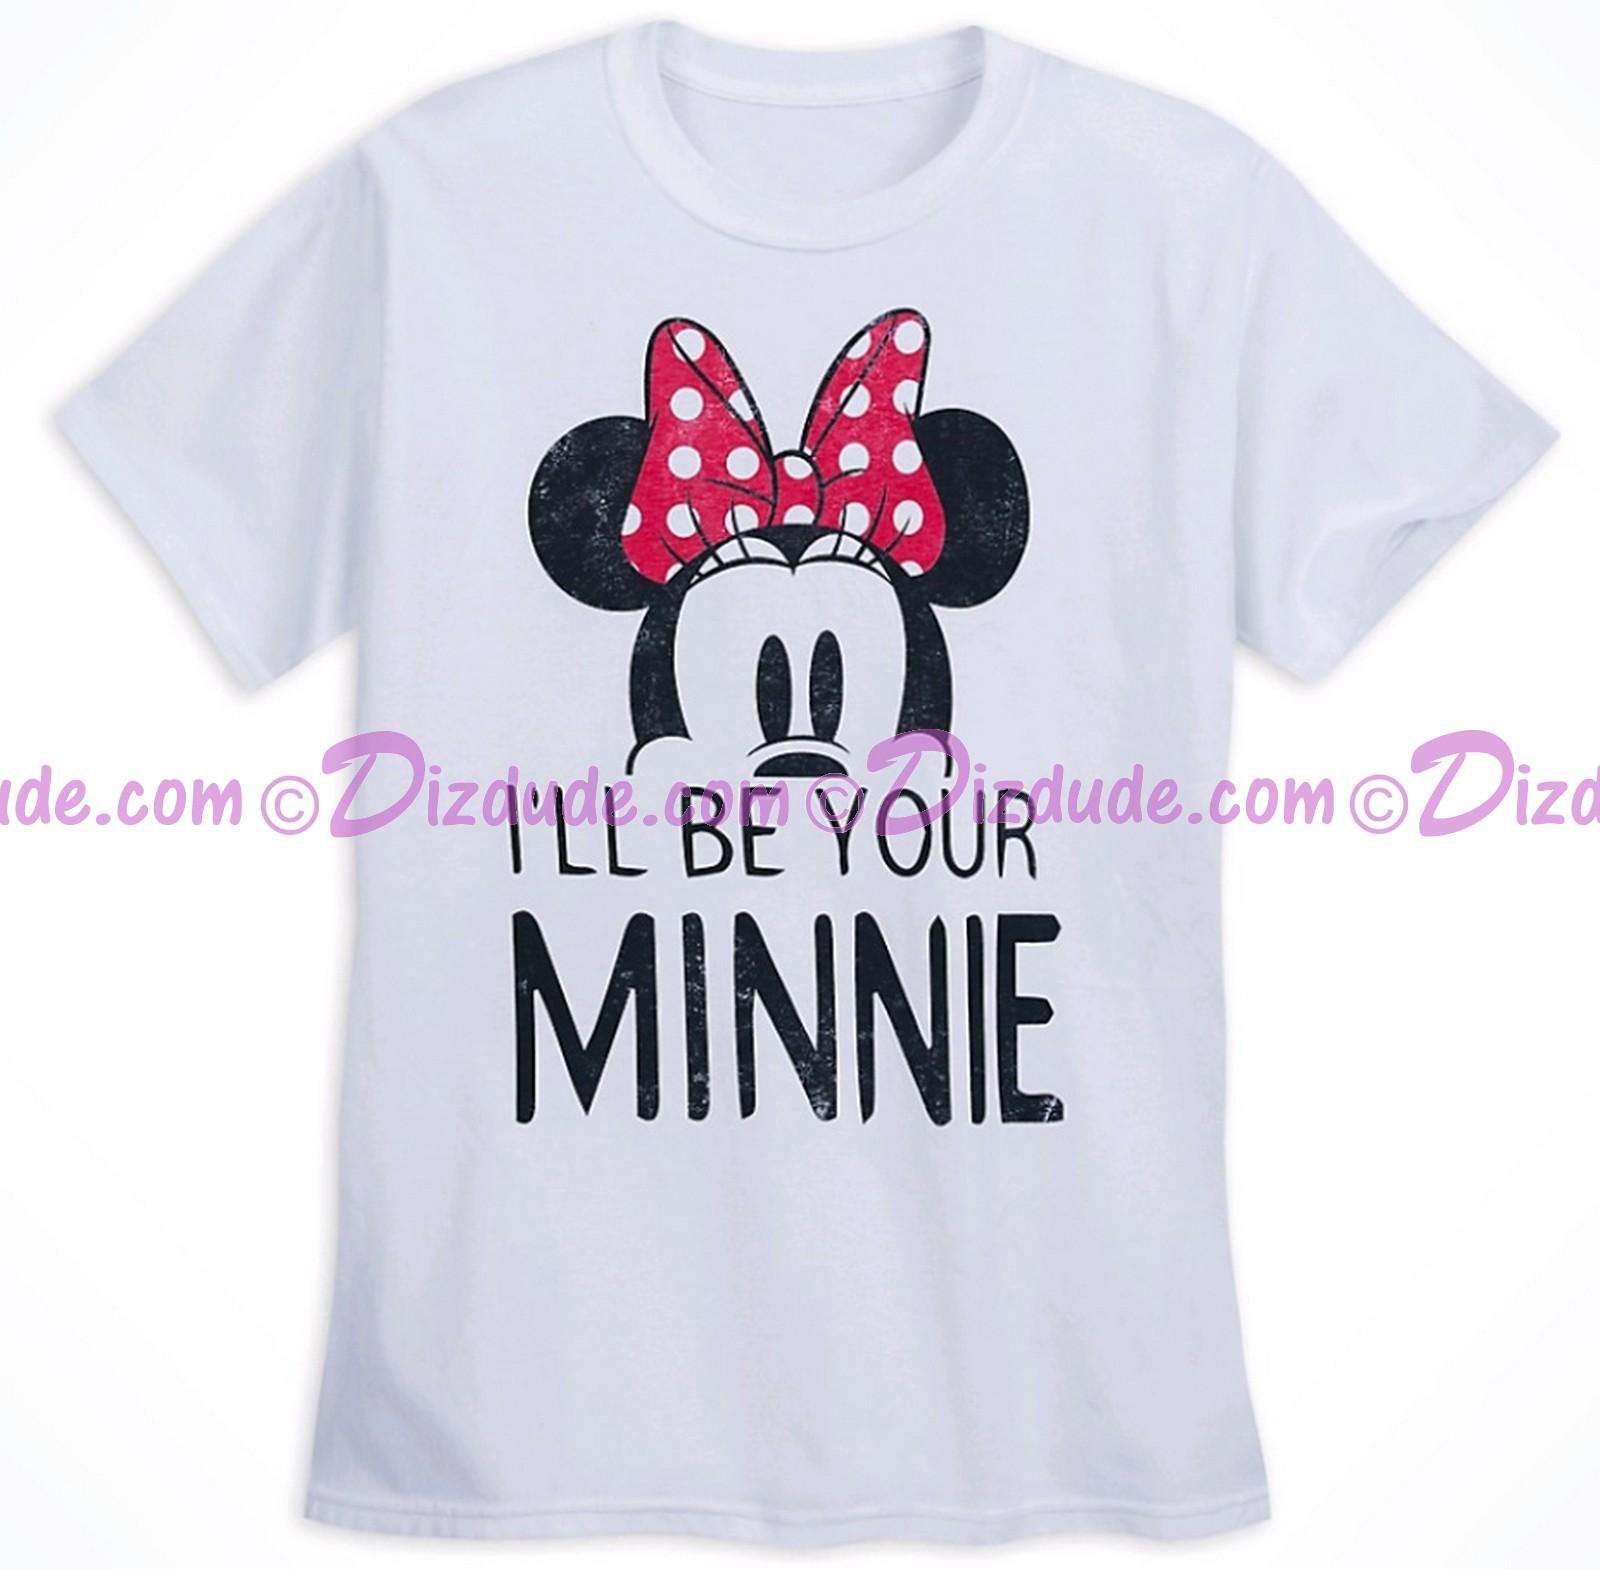 Disney Companion Shirt I'll Be Your Minnie Adult T-shirt (Tee, Tshirt or T shirt)